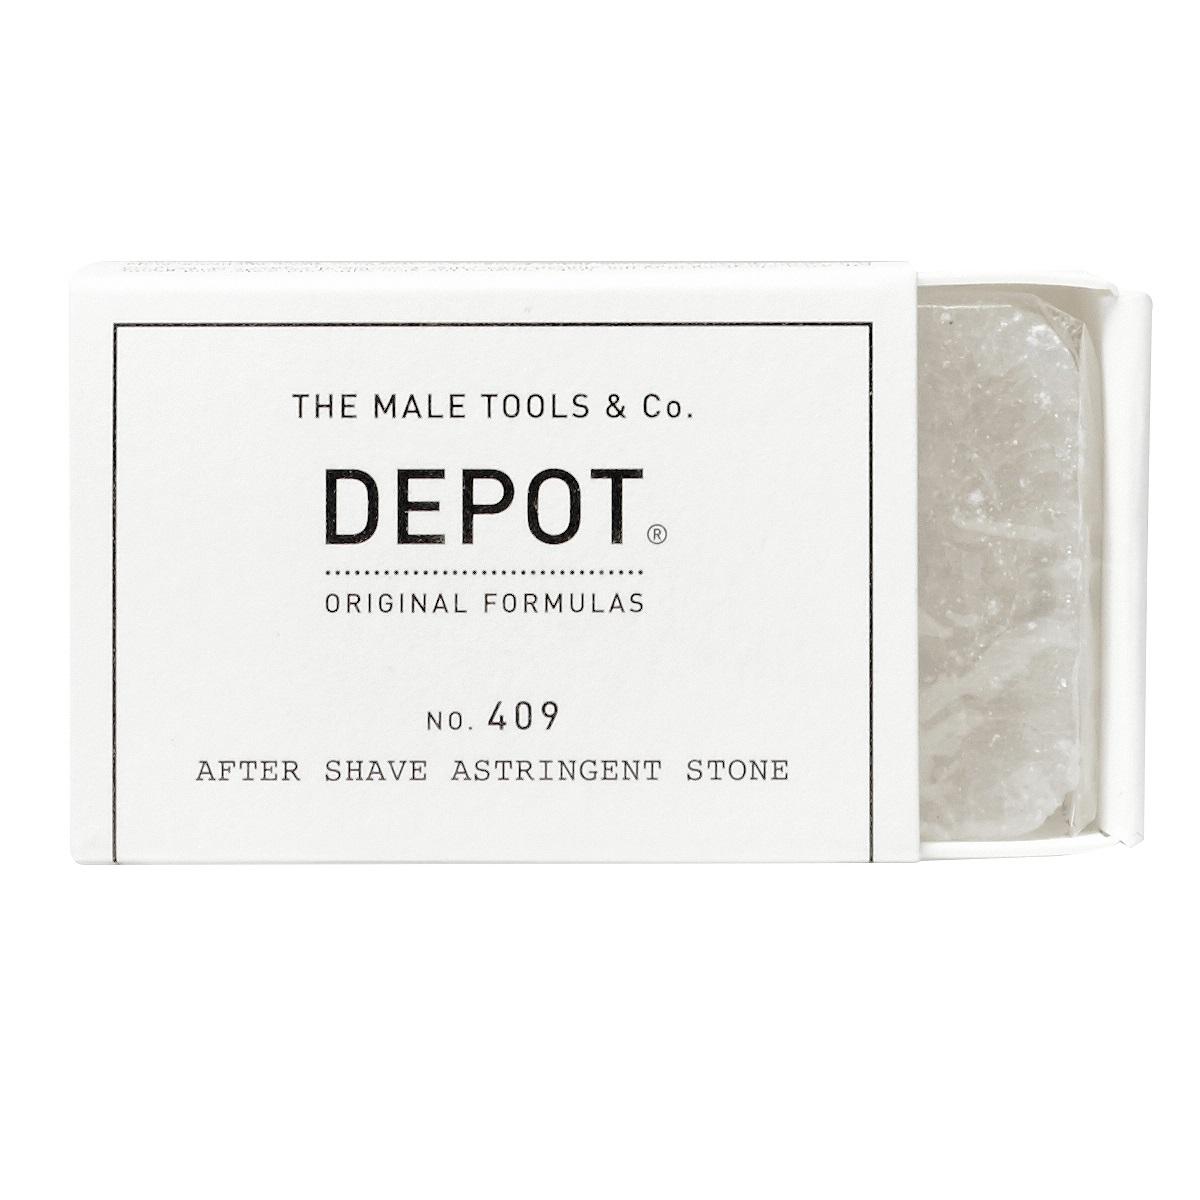 Depot - No. 409 After Shave Astringent Stone